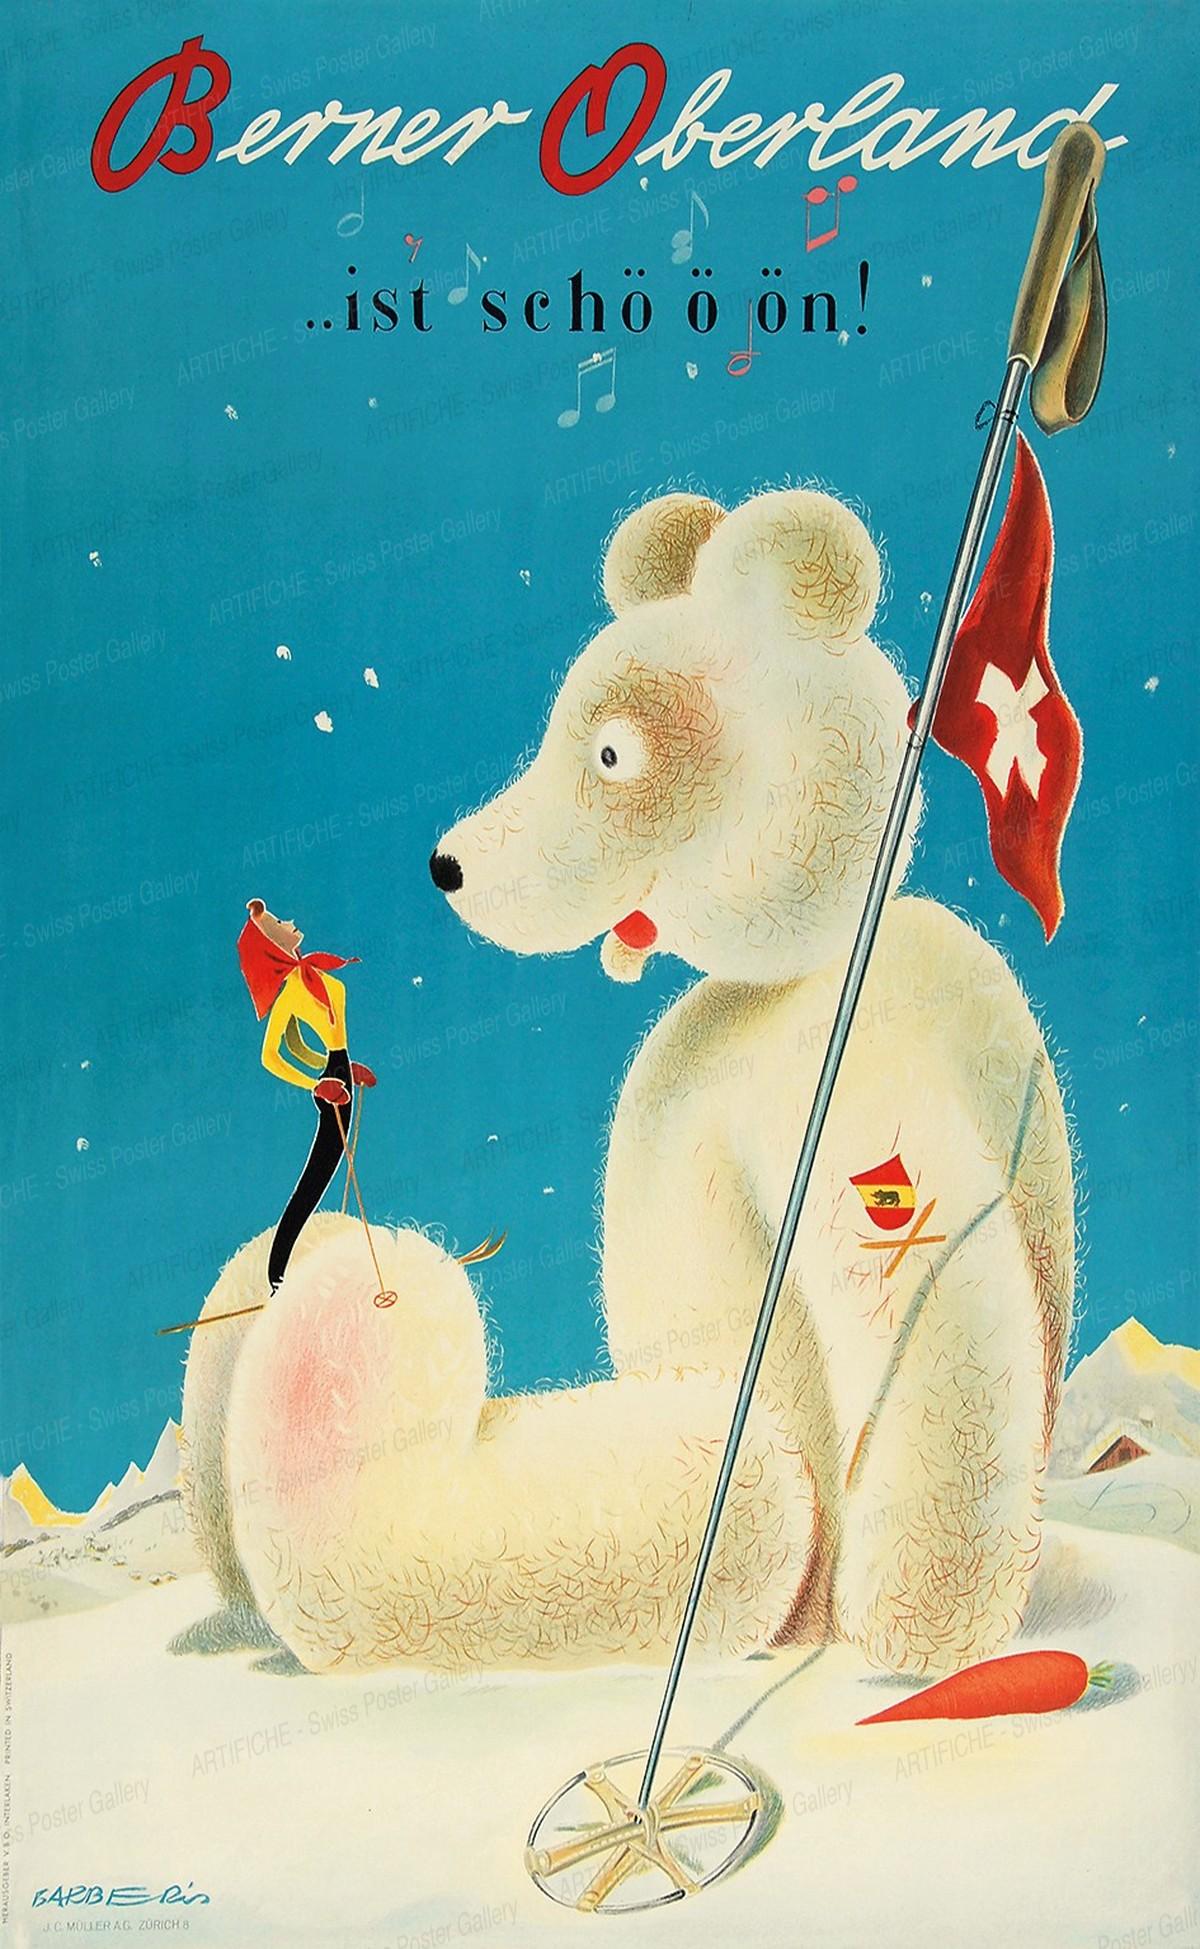 Berner Oberland … ist schööön!, Franco Barberis